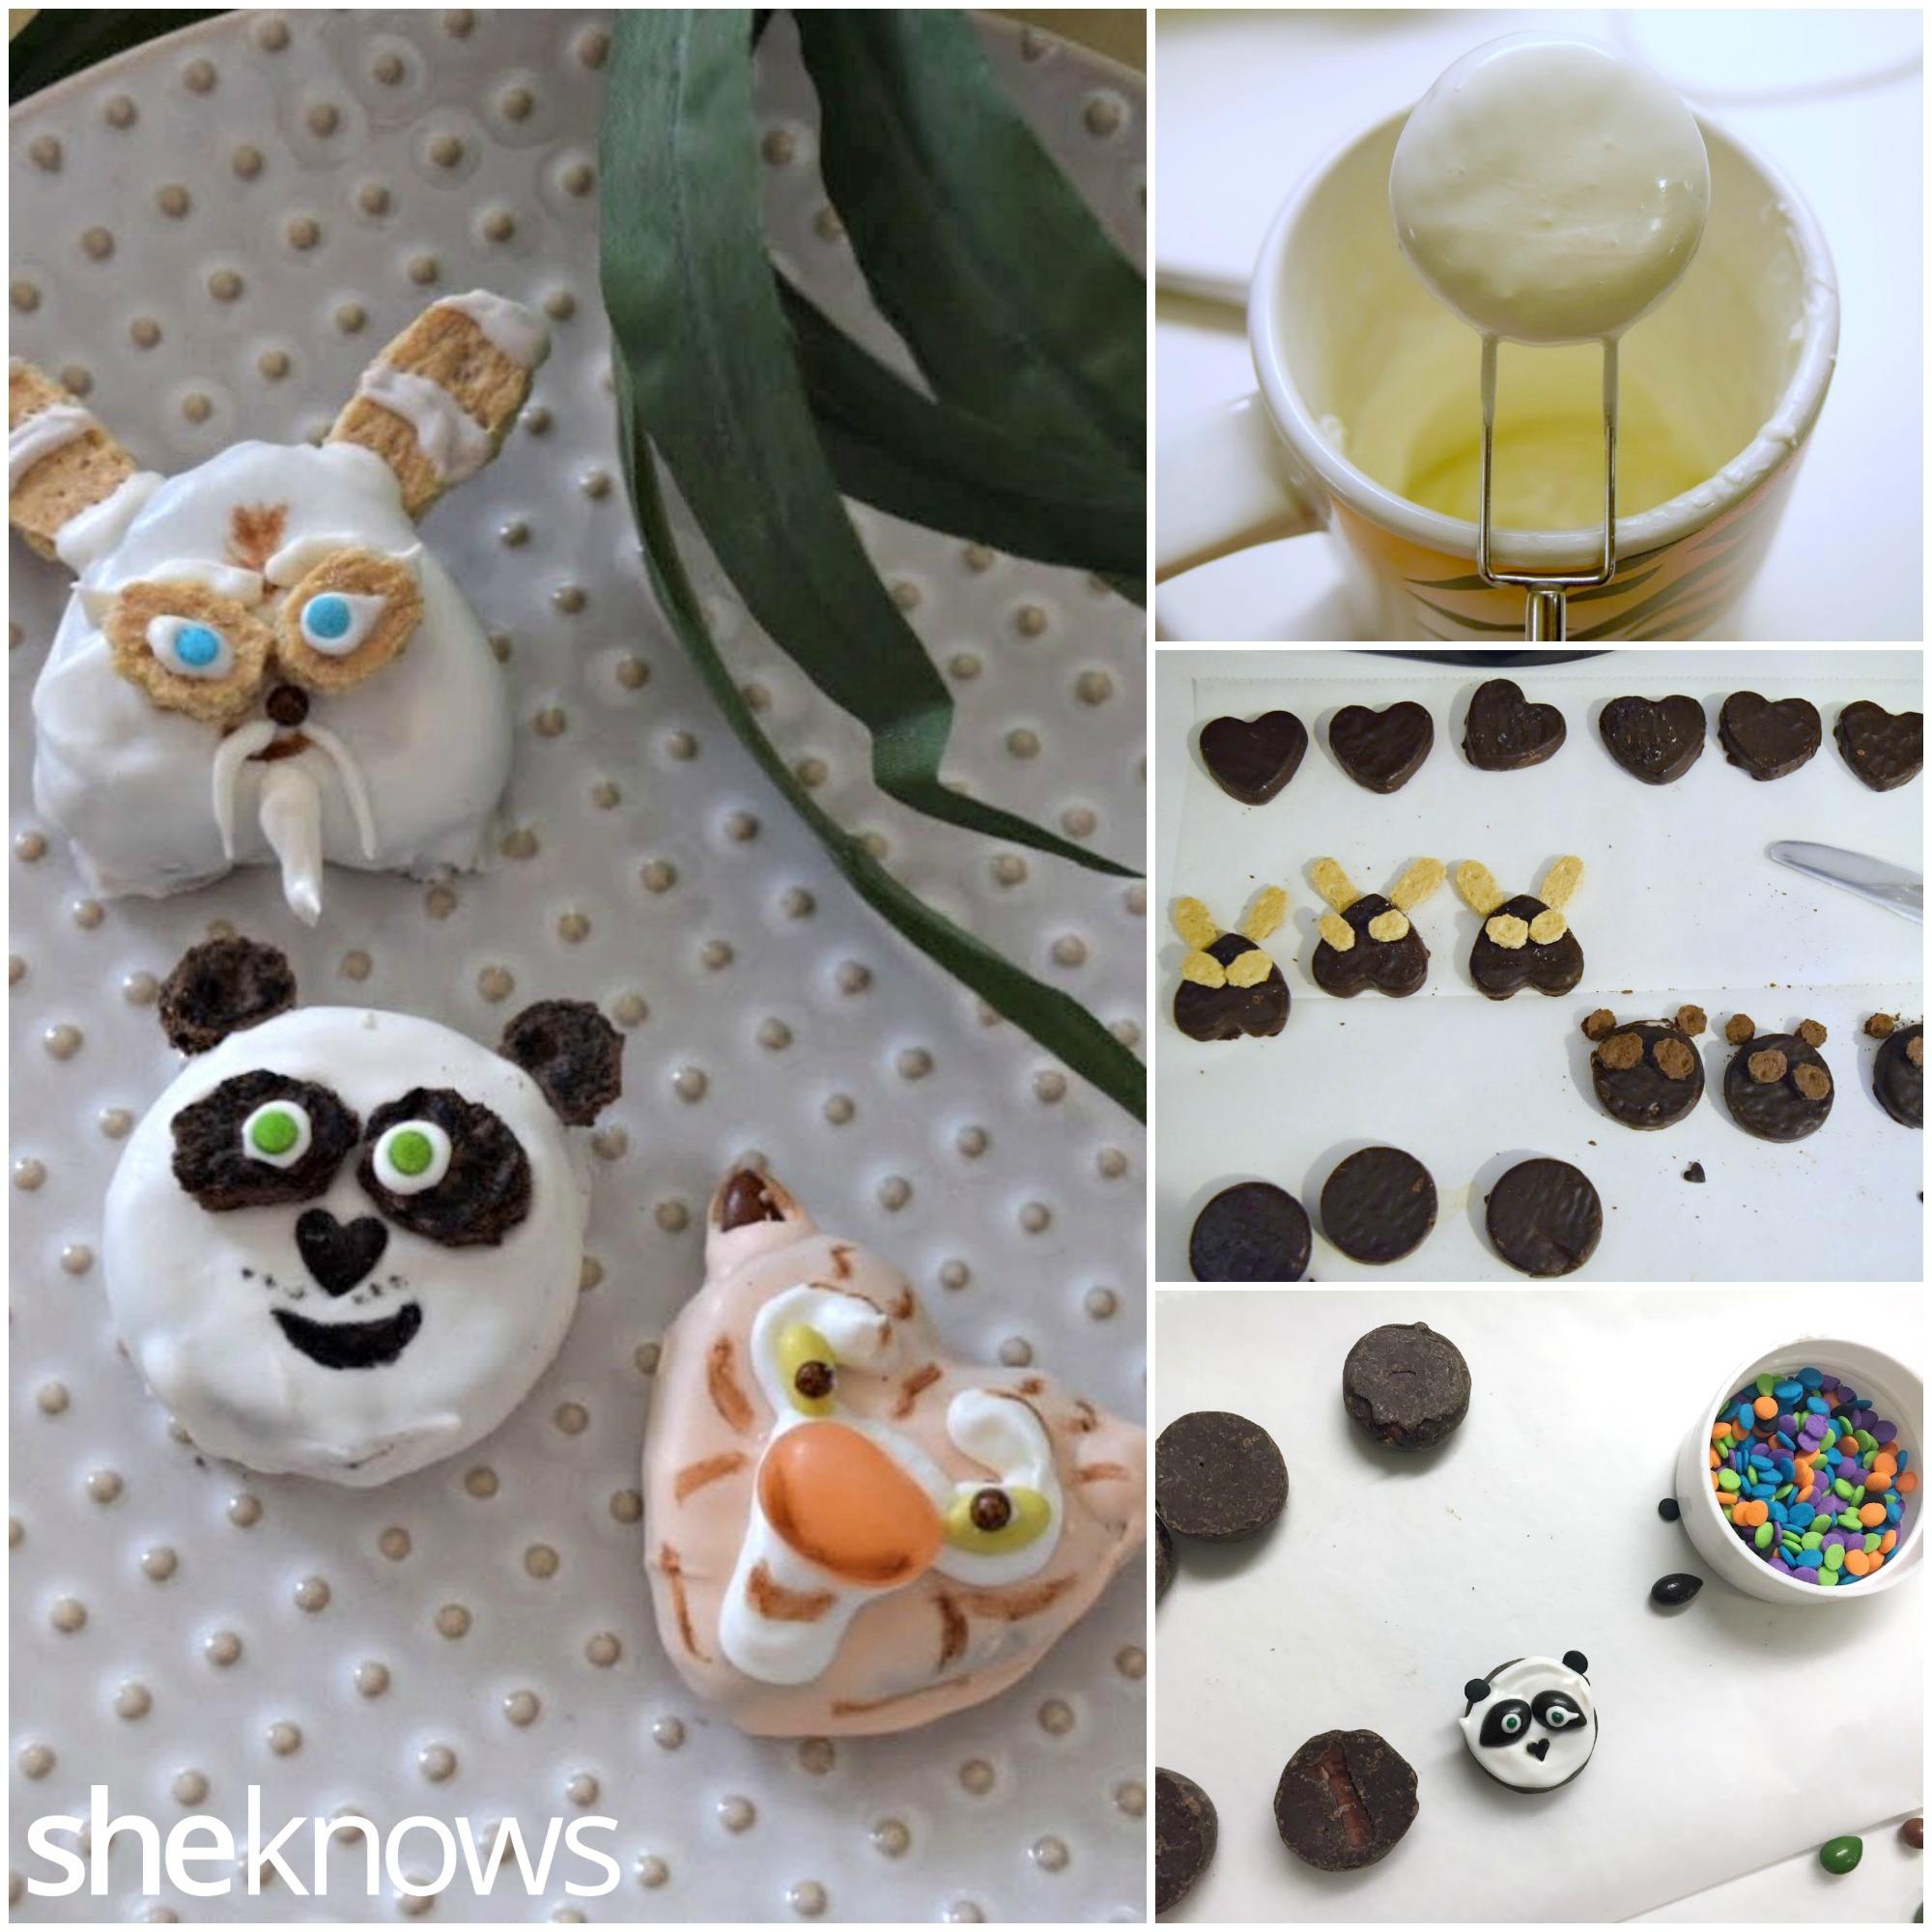 How to make Kung Fu Panda candies